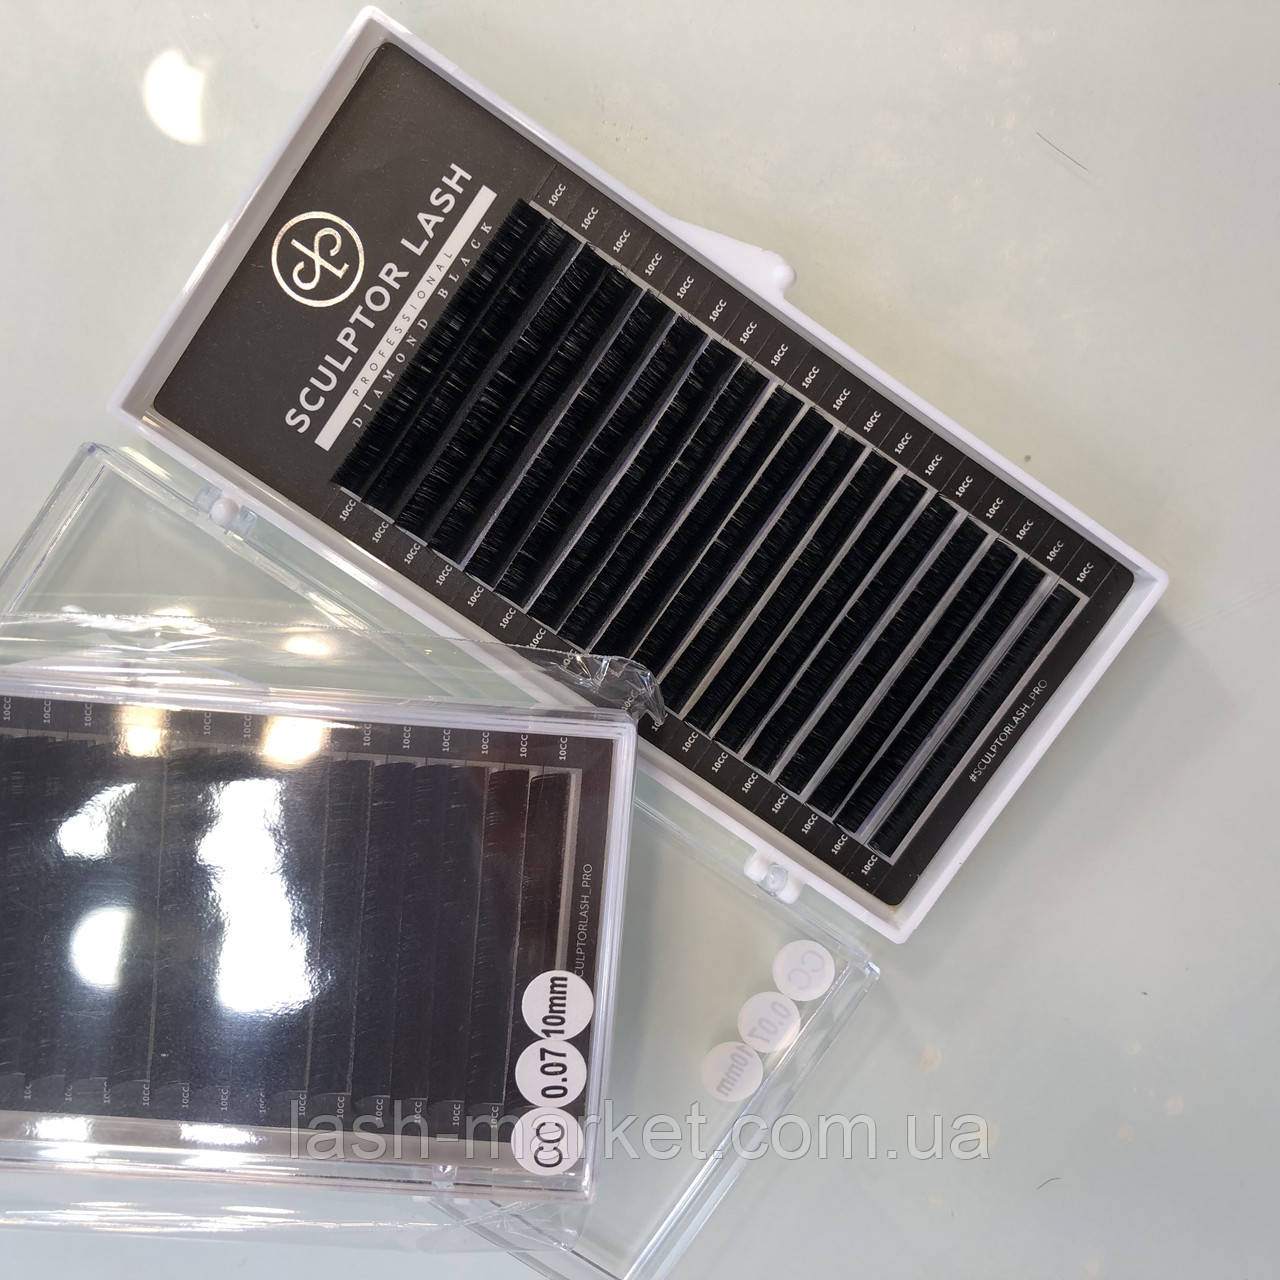 Ресницы CС 0,07 * 9 mm Sculptor Lash Diamond Black